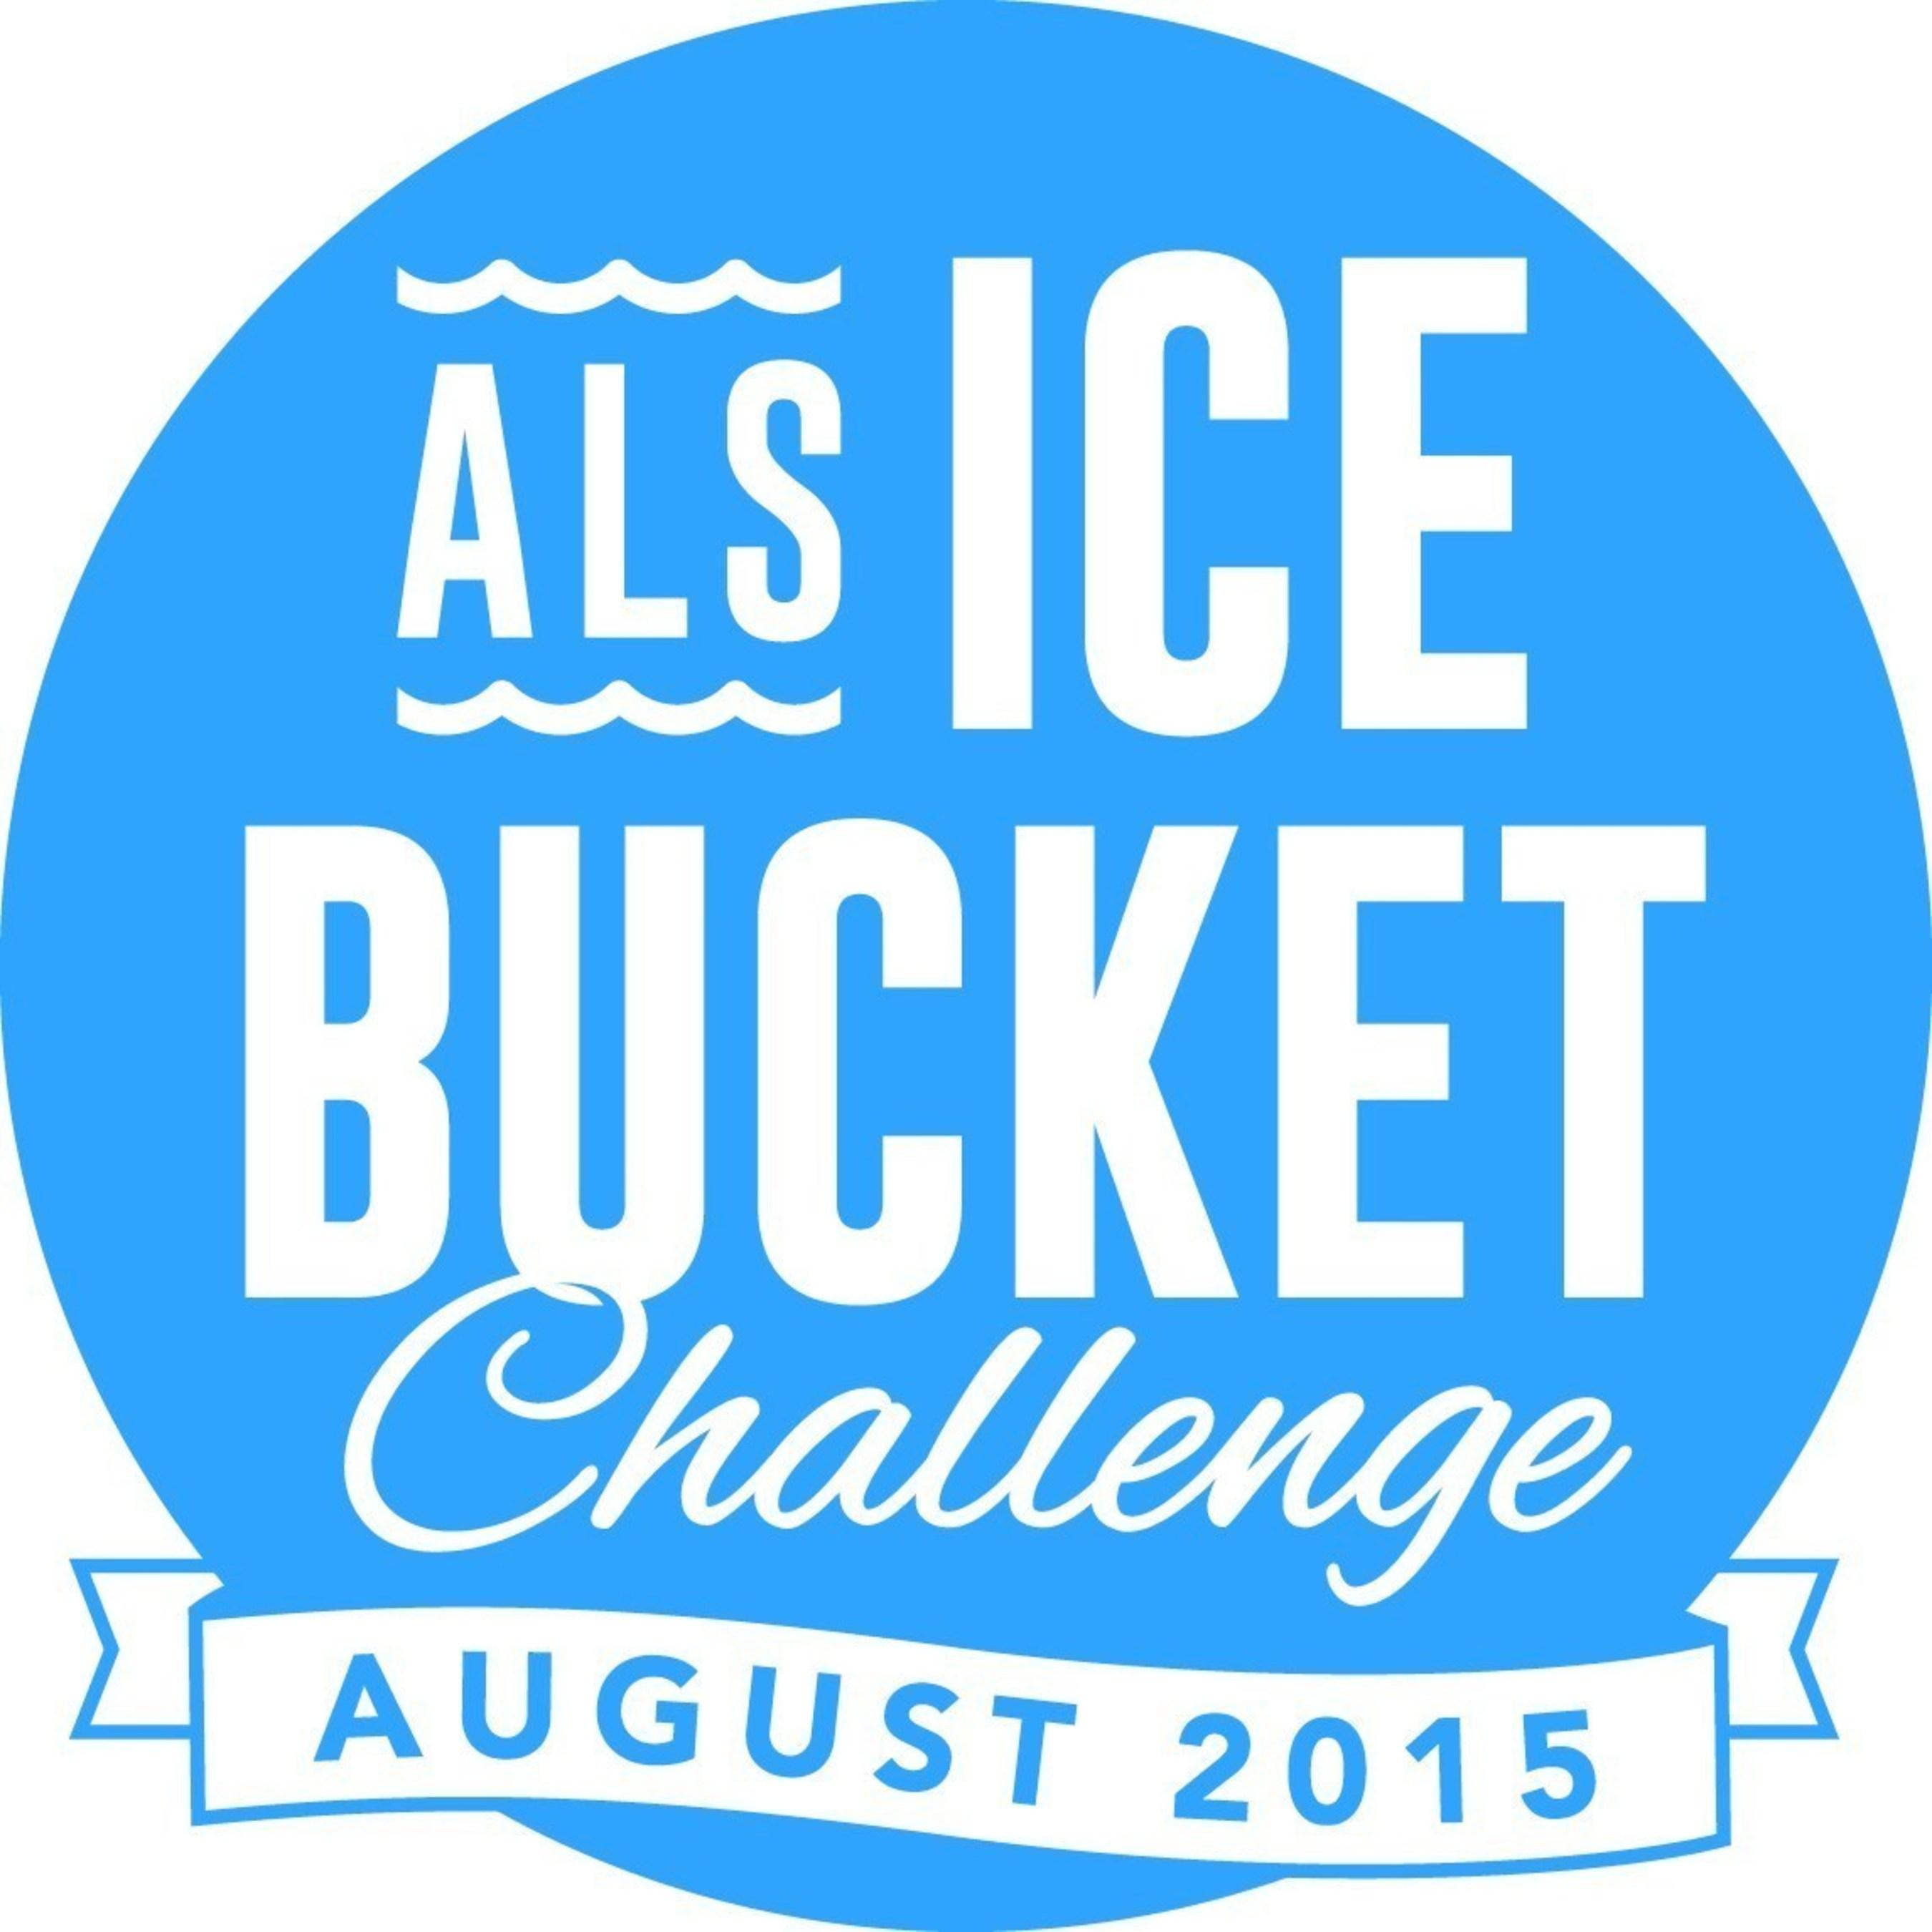 ALS Ice Bucket Challenge logo